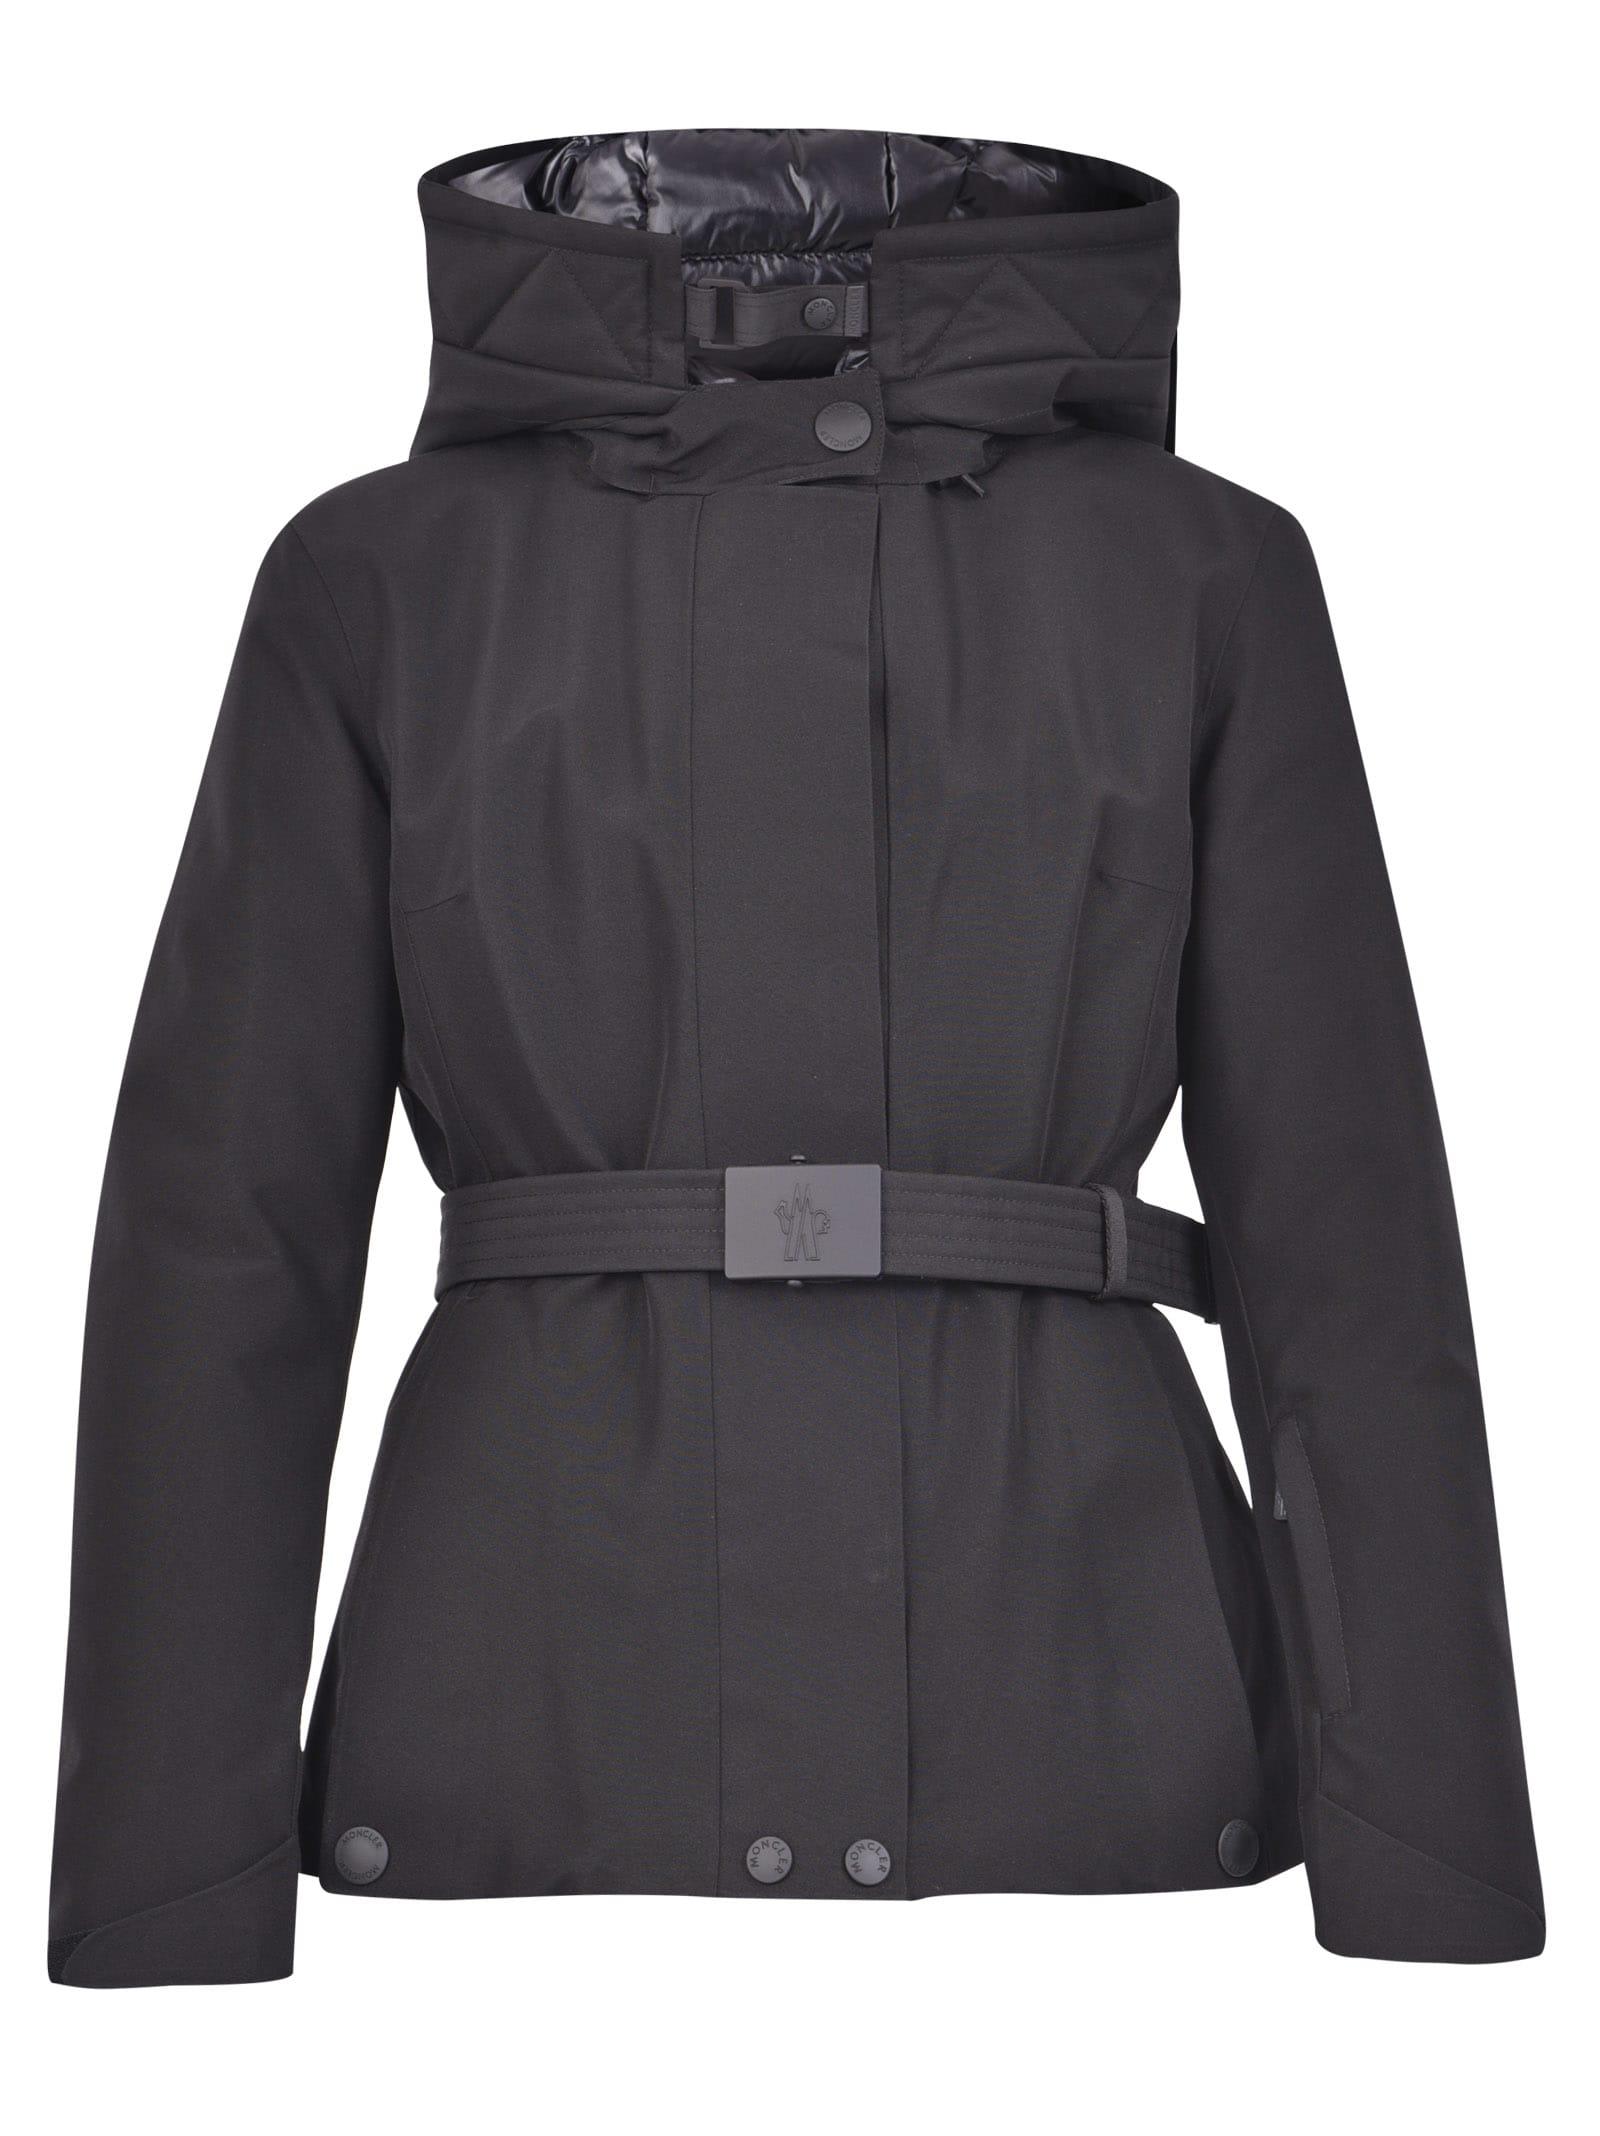 Moncler Grenoble Laplance Jacket